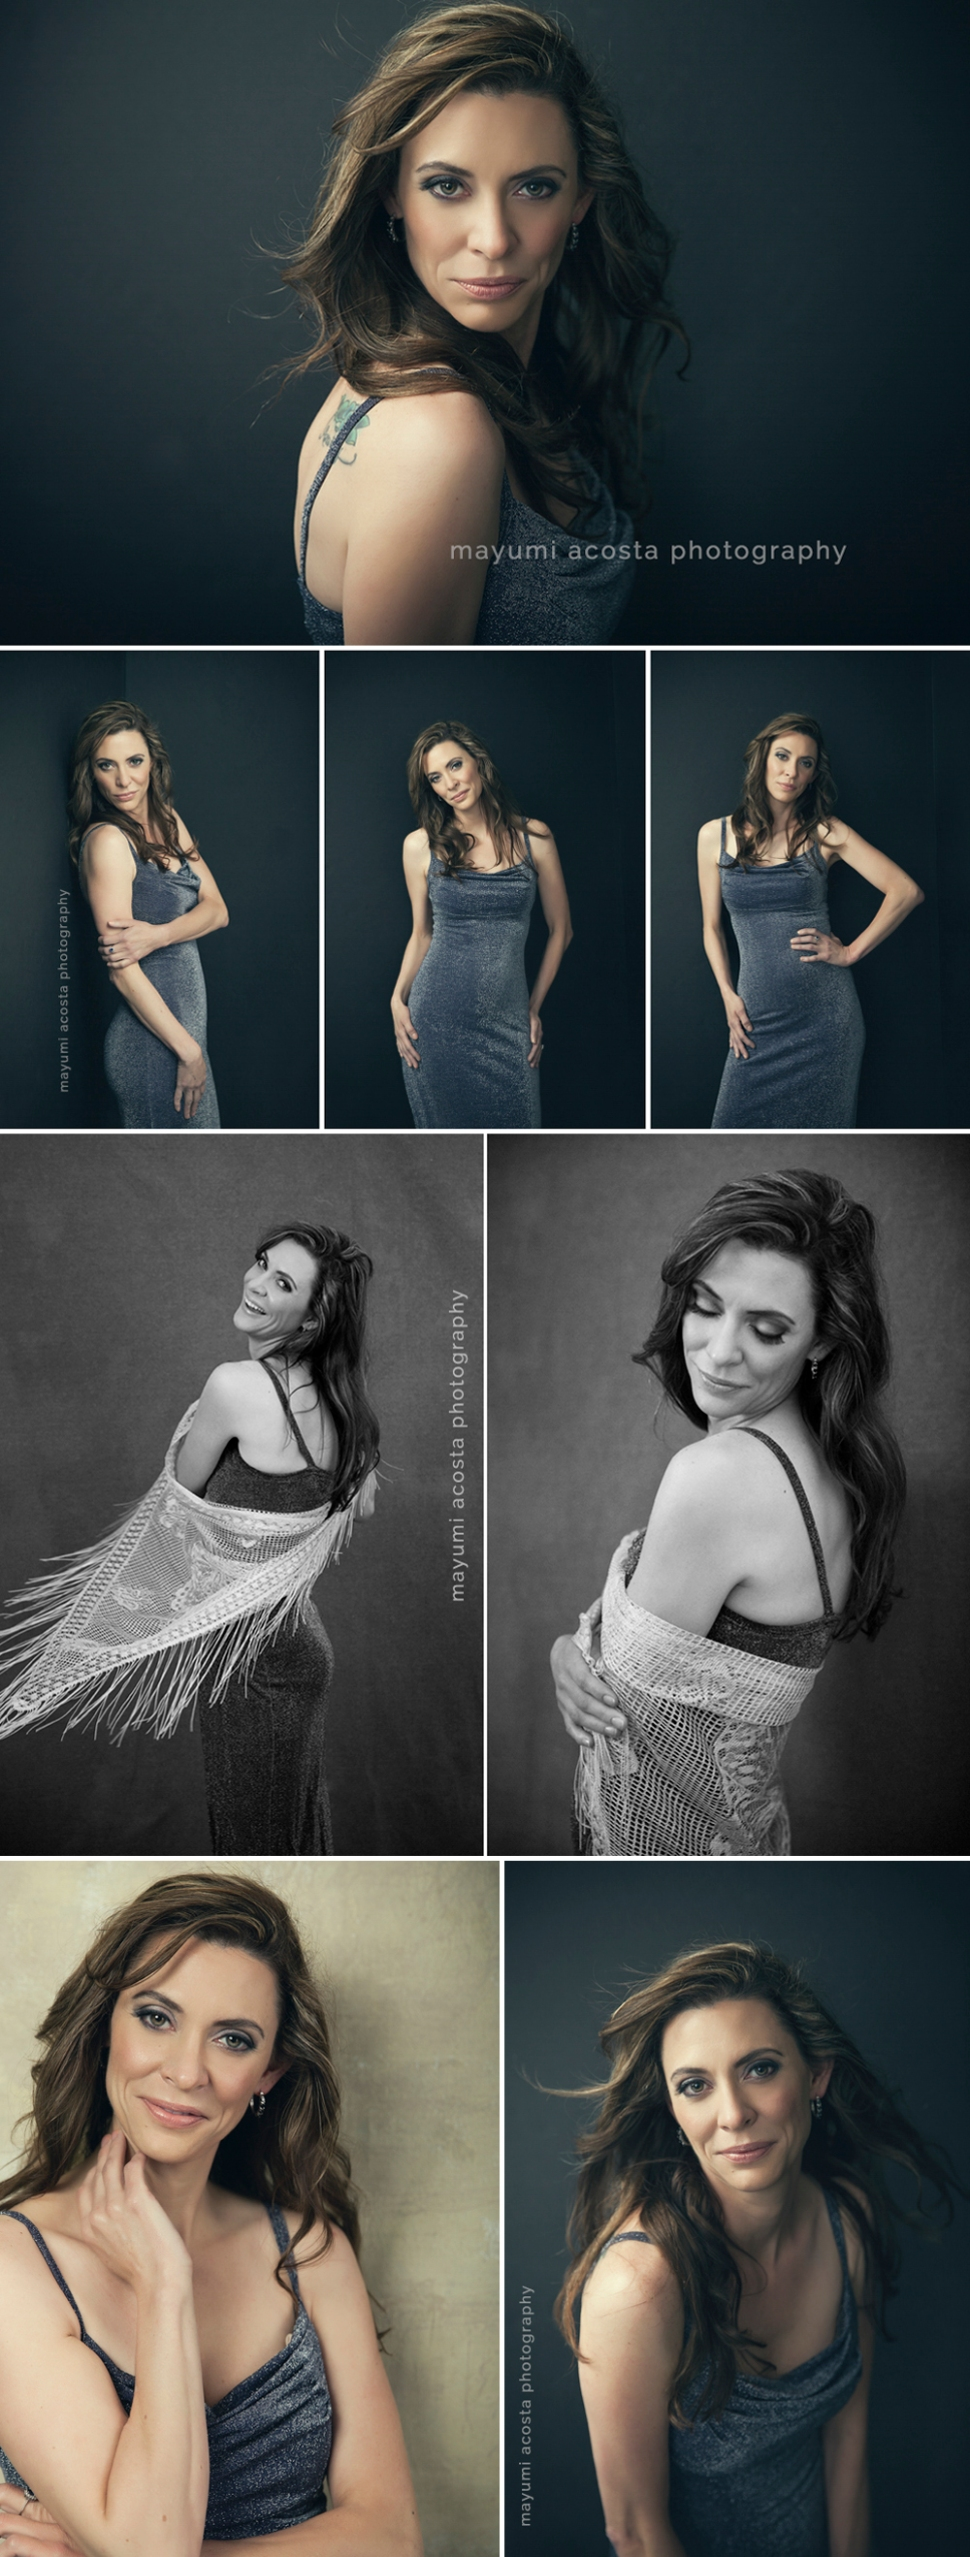 Glamour Portraits, personilized Photoshoots, modern studio Portraits, Mayumi Acosta Photography, Sacramento Glamour Photographer, Sacramento Photography, Natomas Photographer